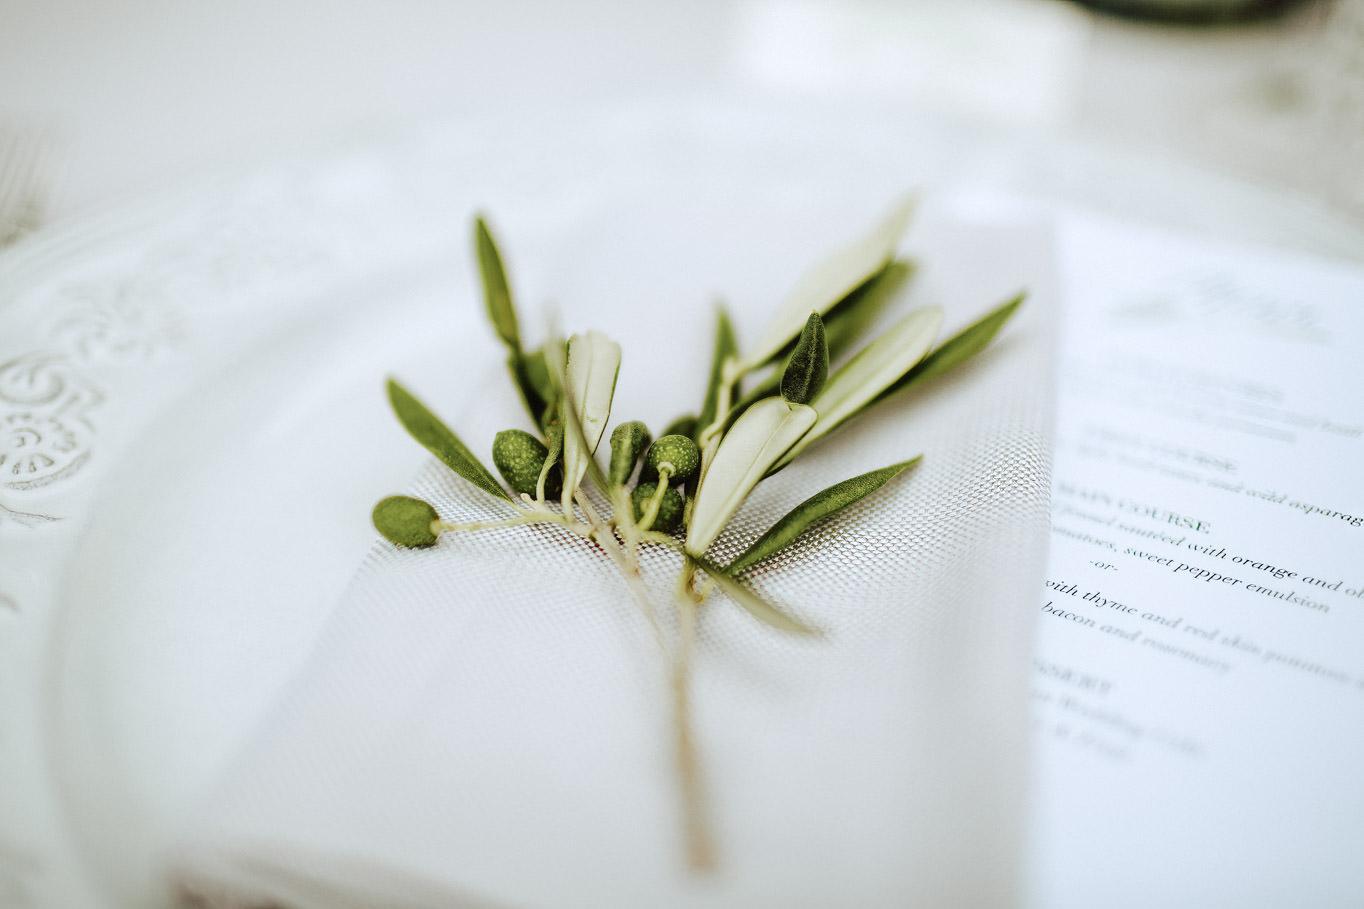 olive flower as wedding placeholder